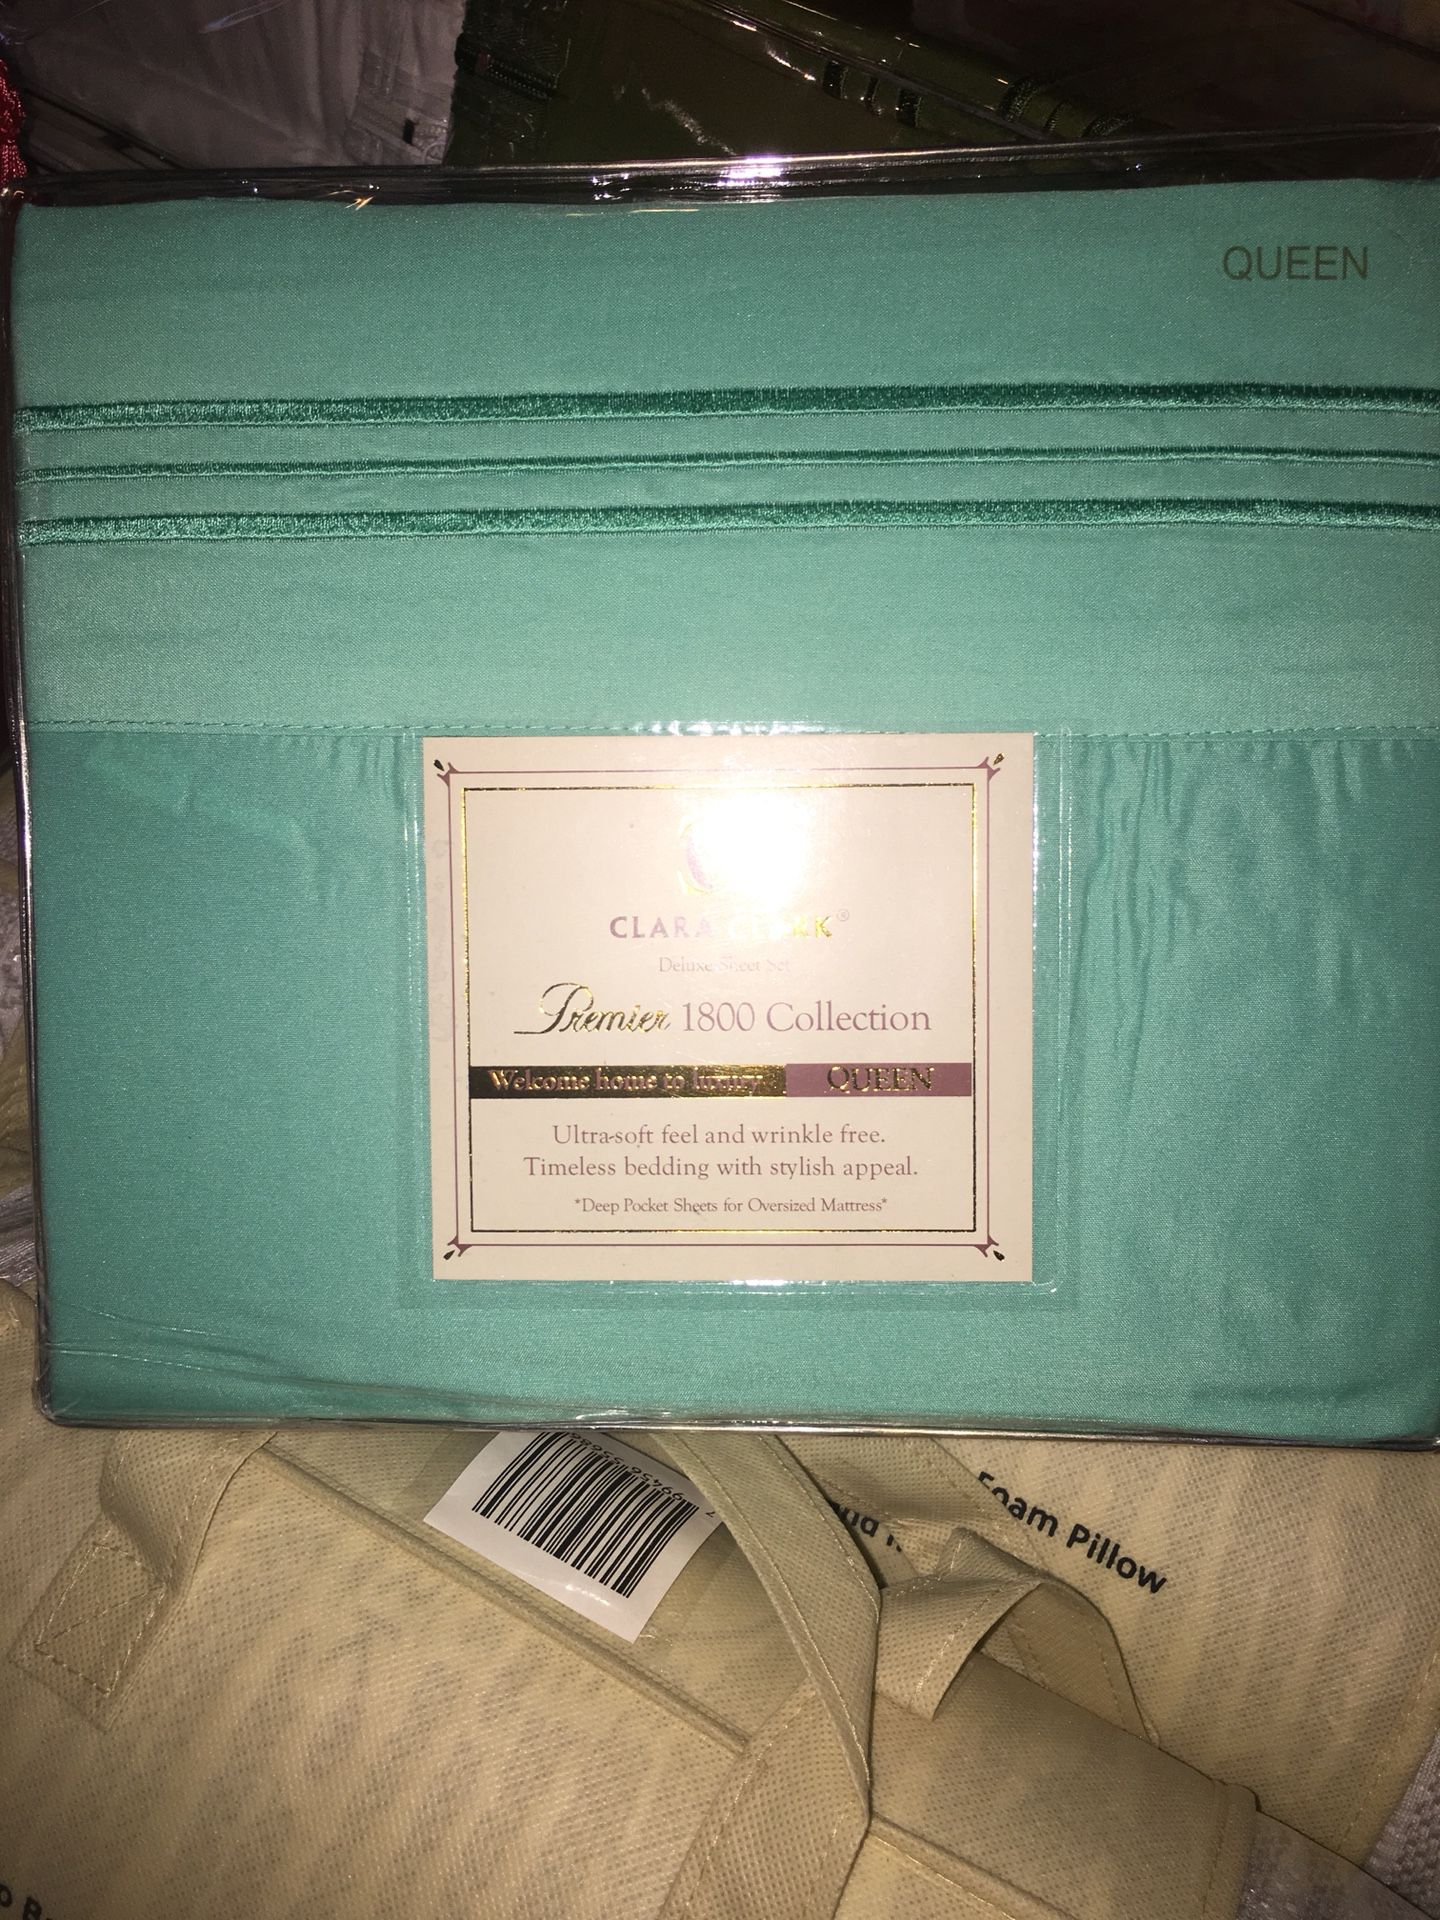 Clara Clark deluxe sheet set And Memory pillows